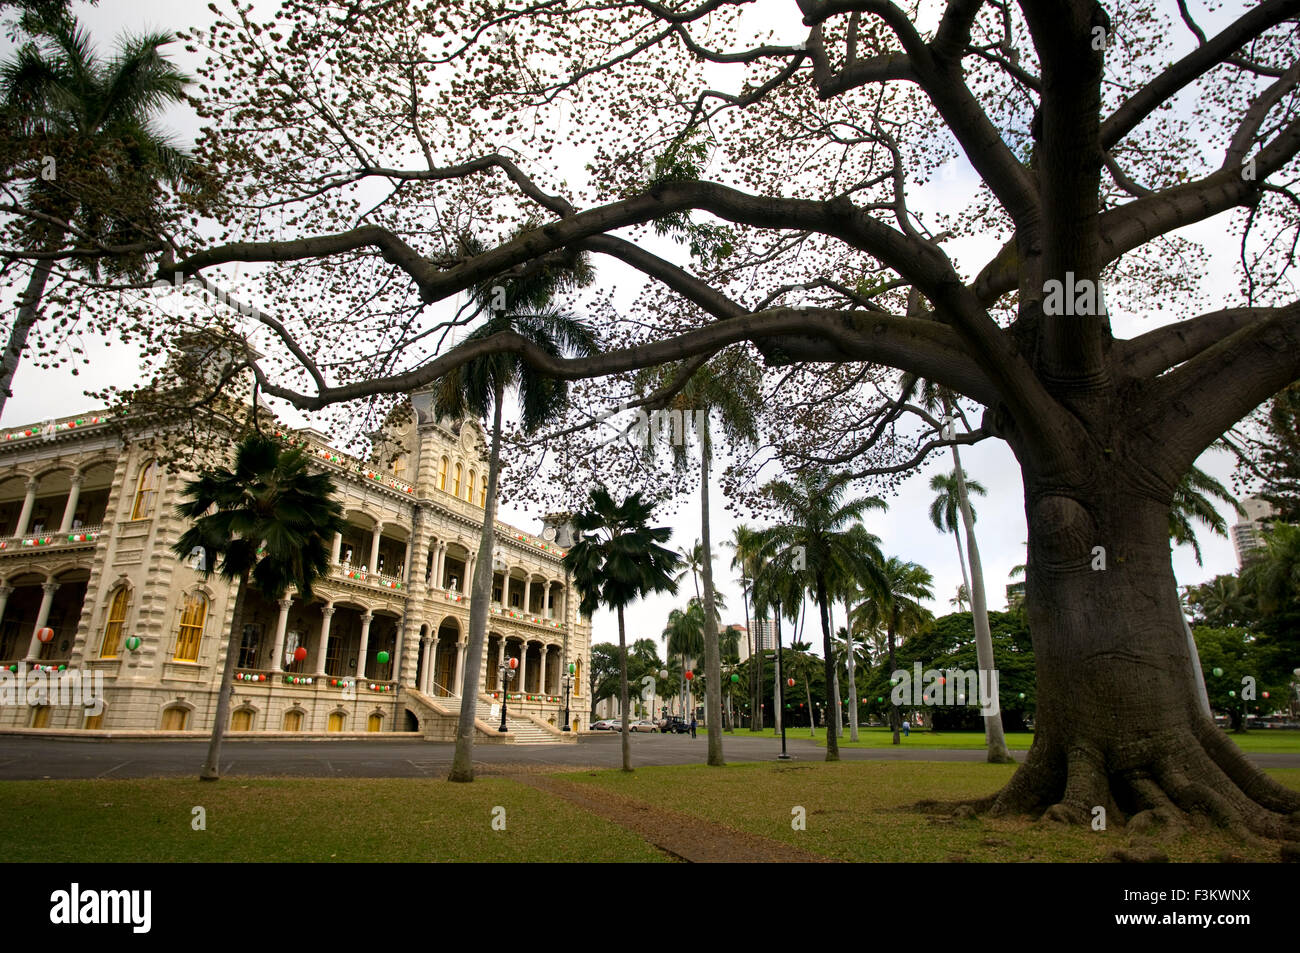 The Iolani Palace In Honolulu, Oahu, Hawaii, USA. Iolani Palace, the only royal palace in the USA; downtown historic Stock Photo